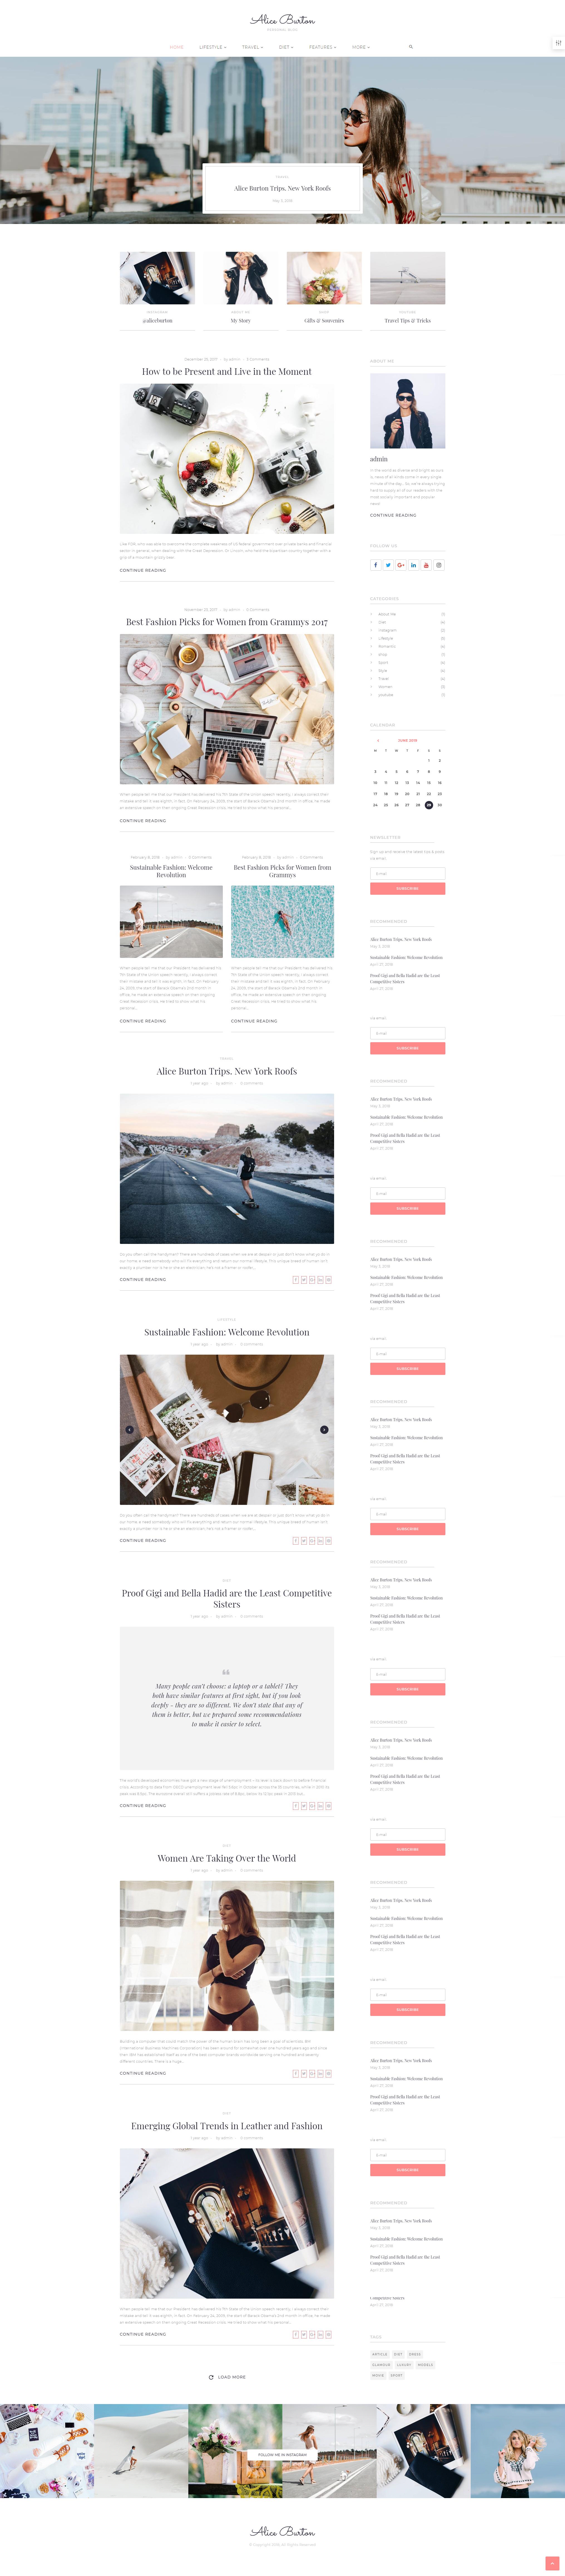 Skin Options - WordPress Theme For News Portal